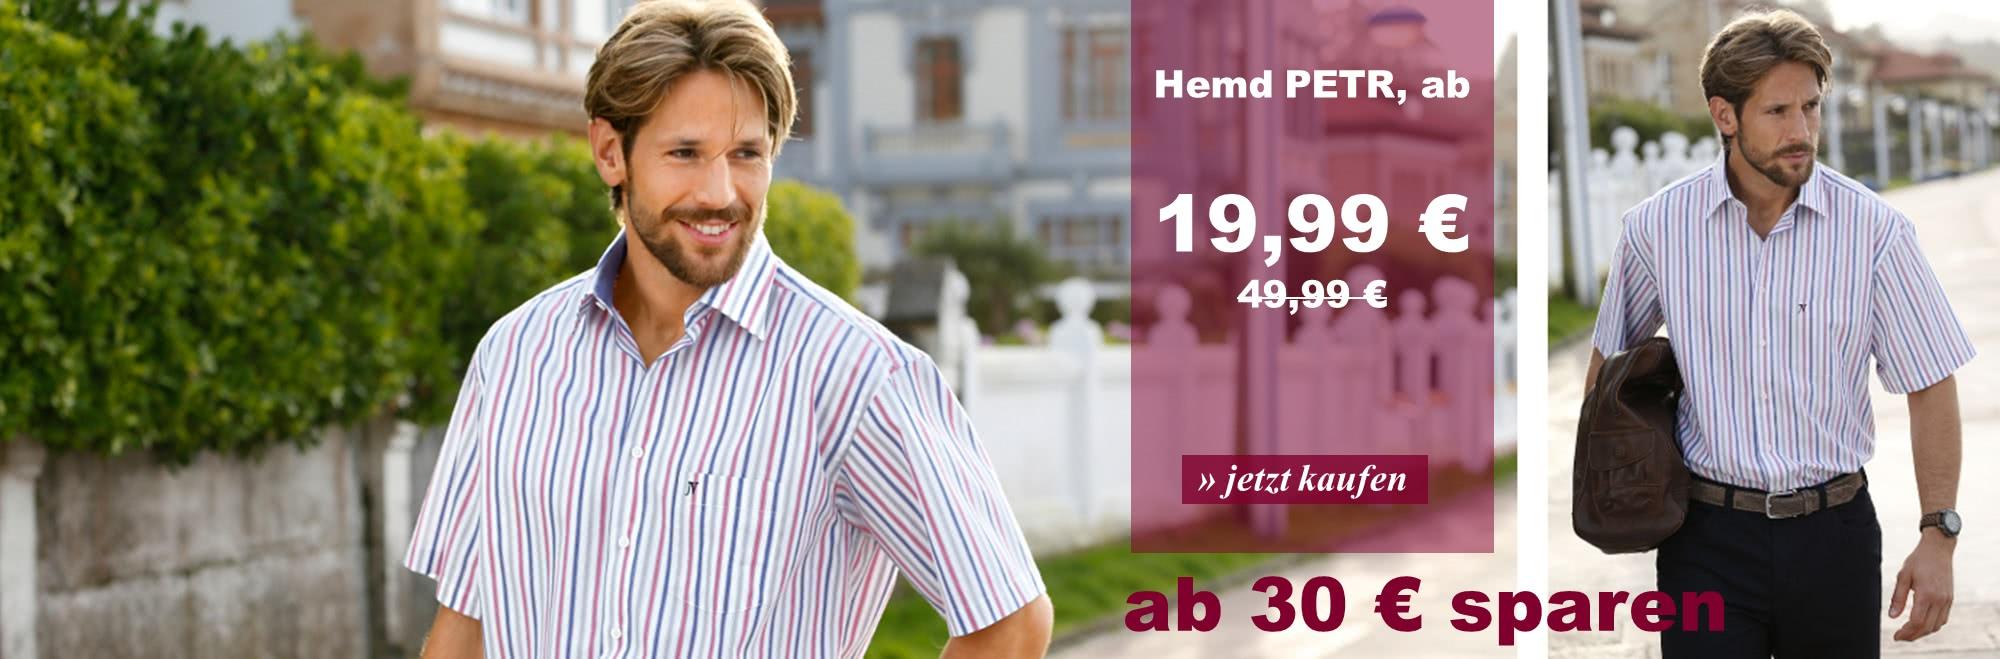 Hemd PETR